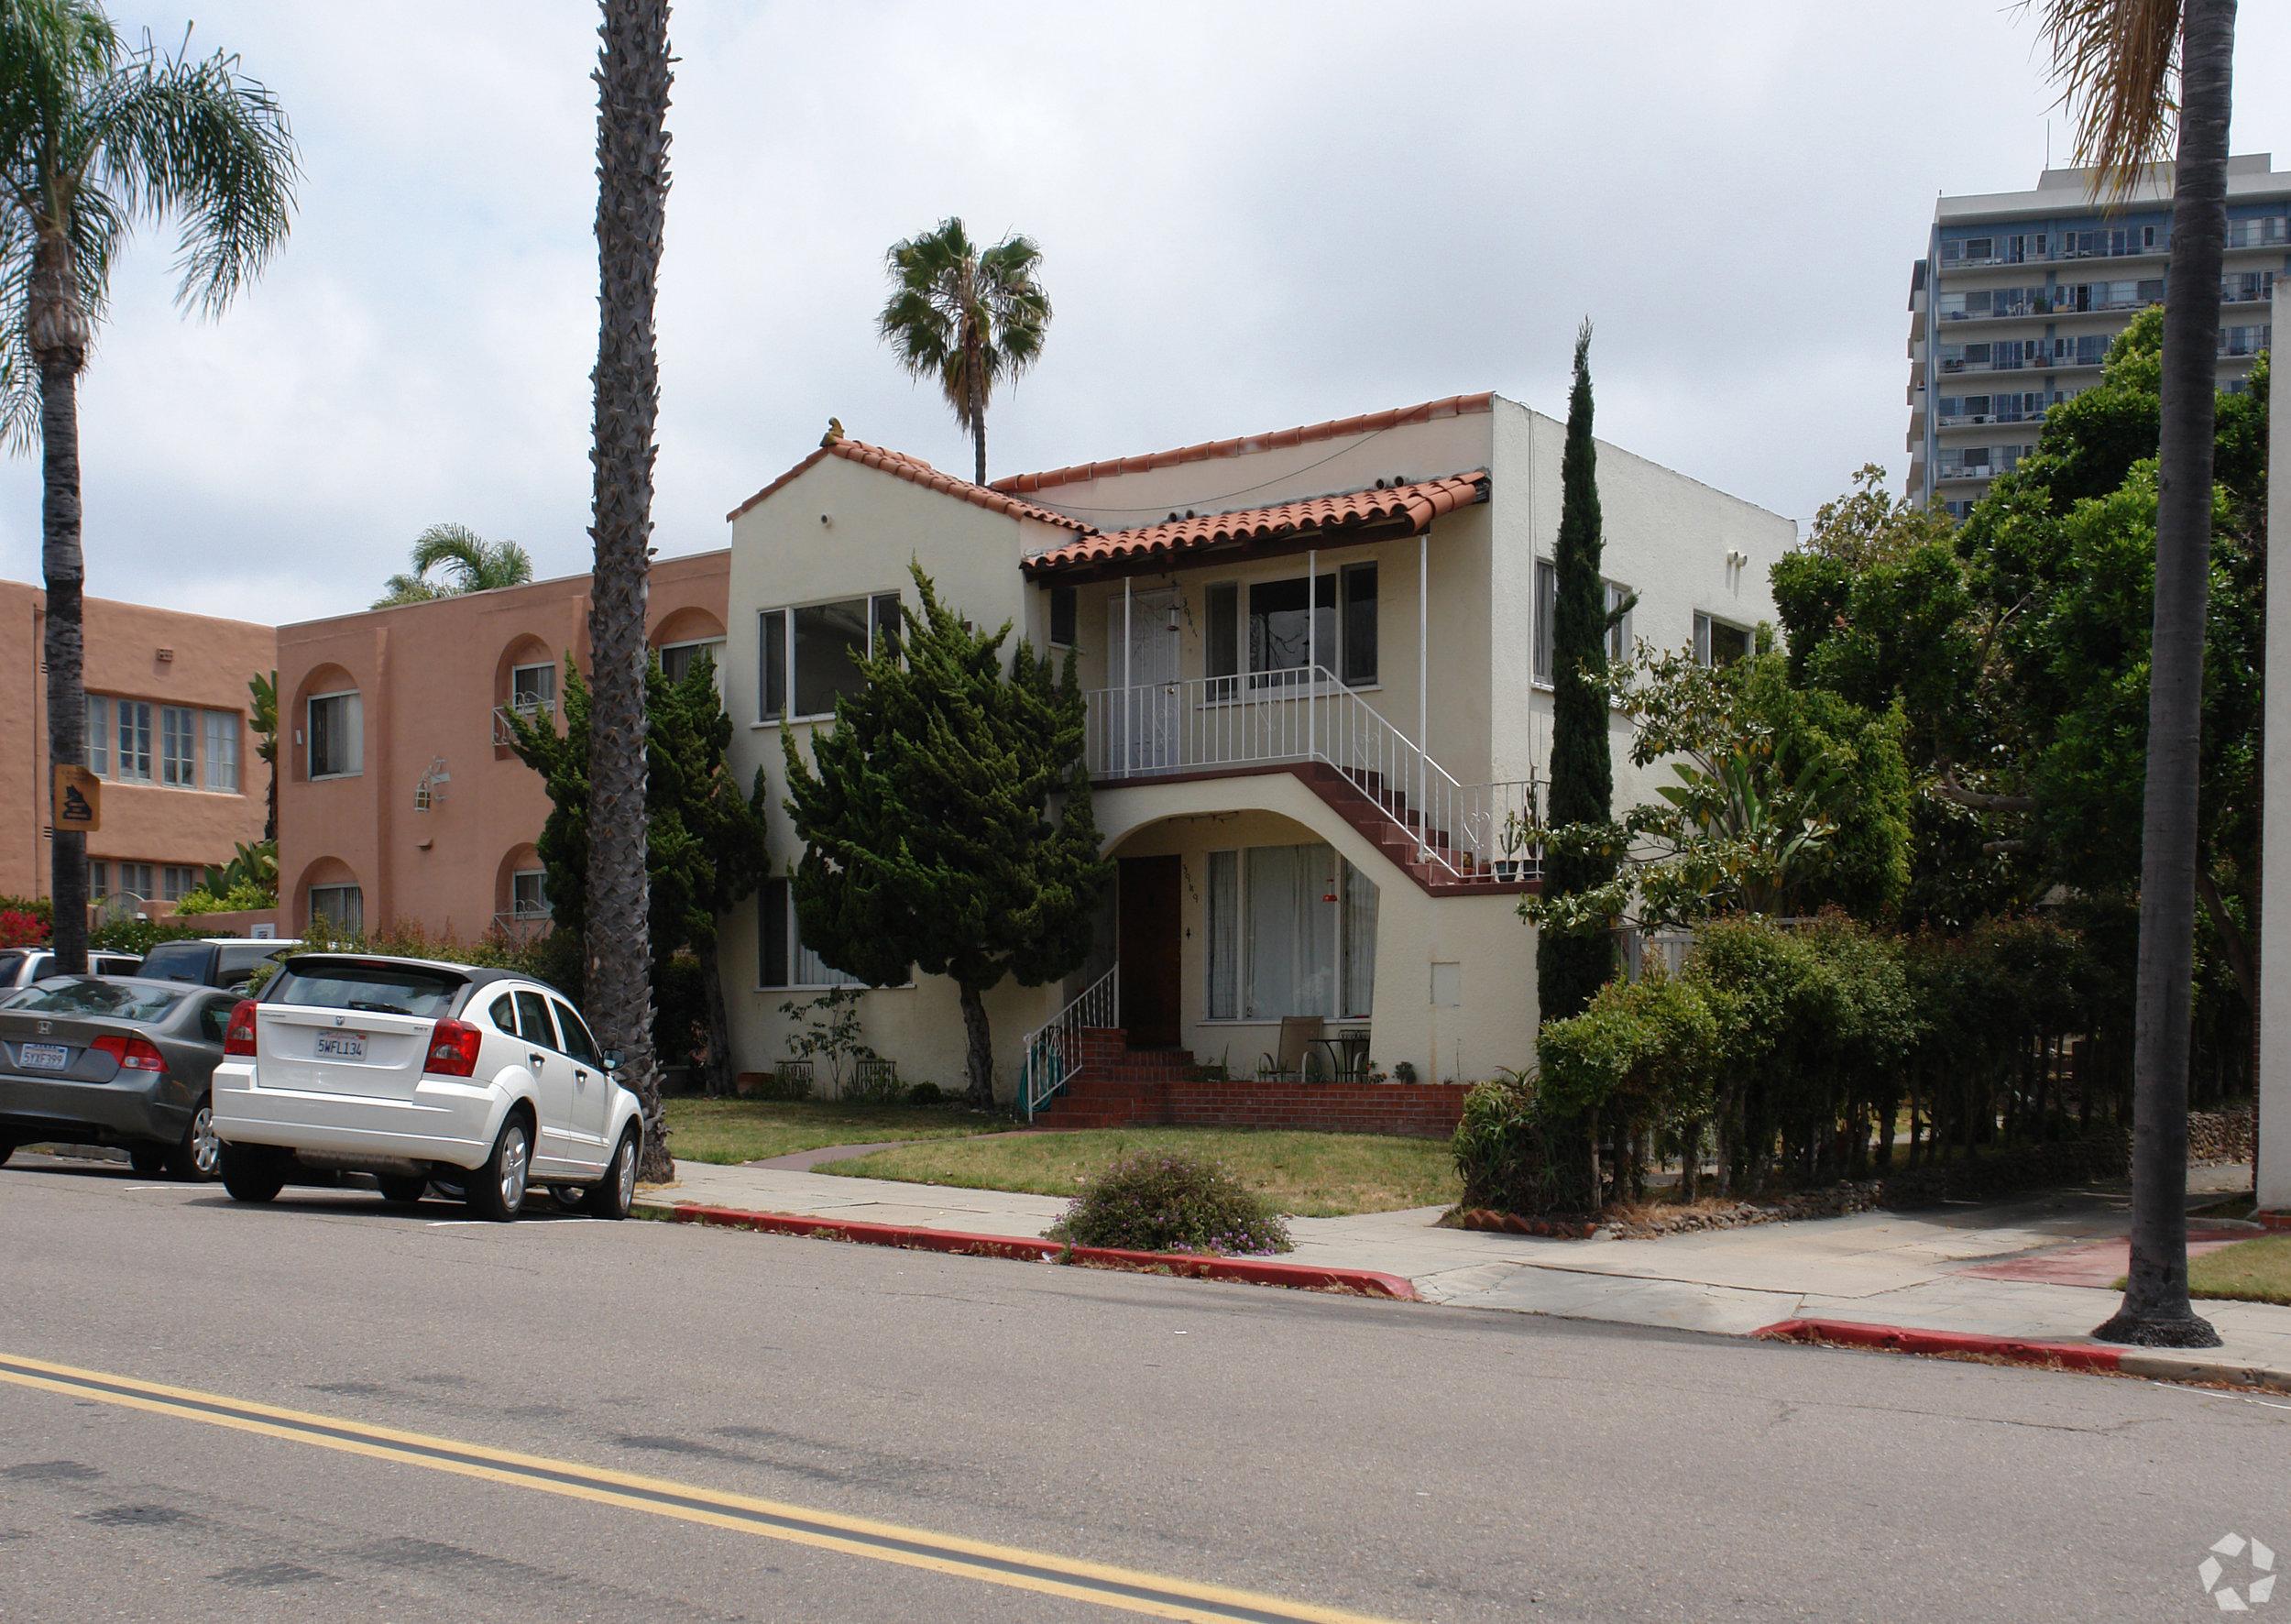 3945 Centre Street - Hillcrest7 Units$1,775,000